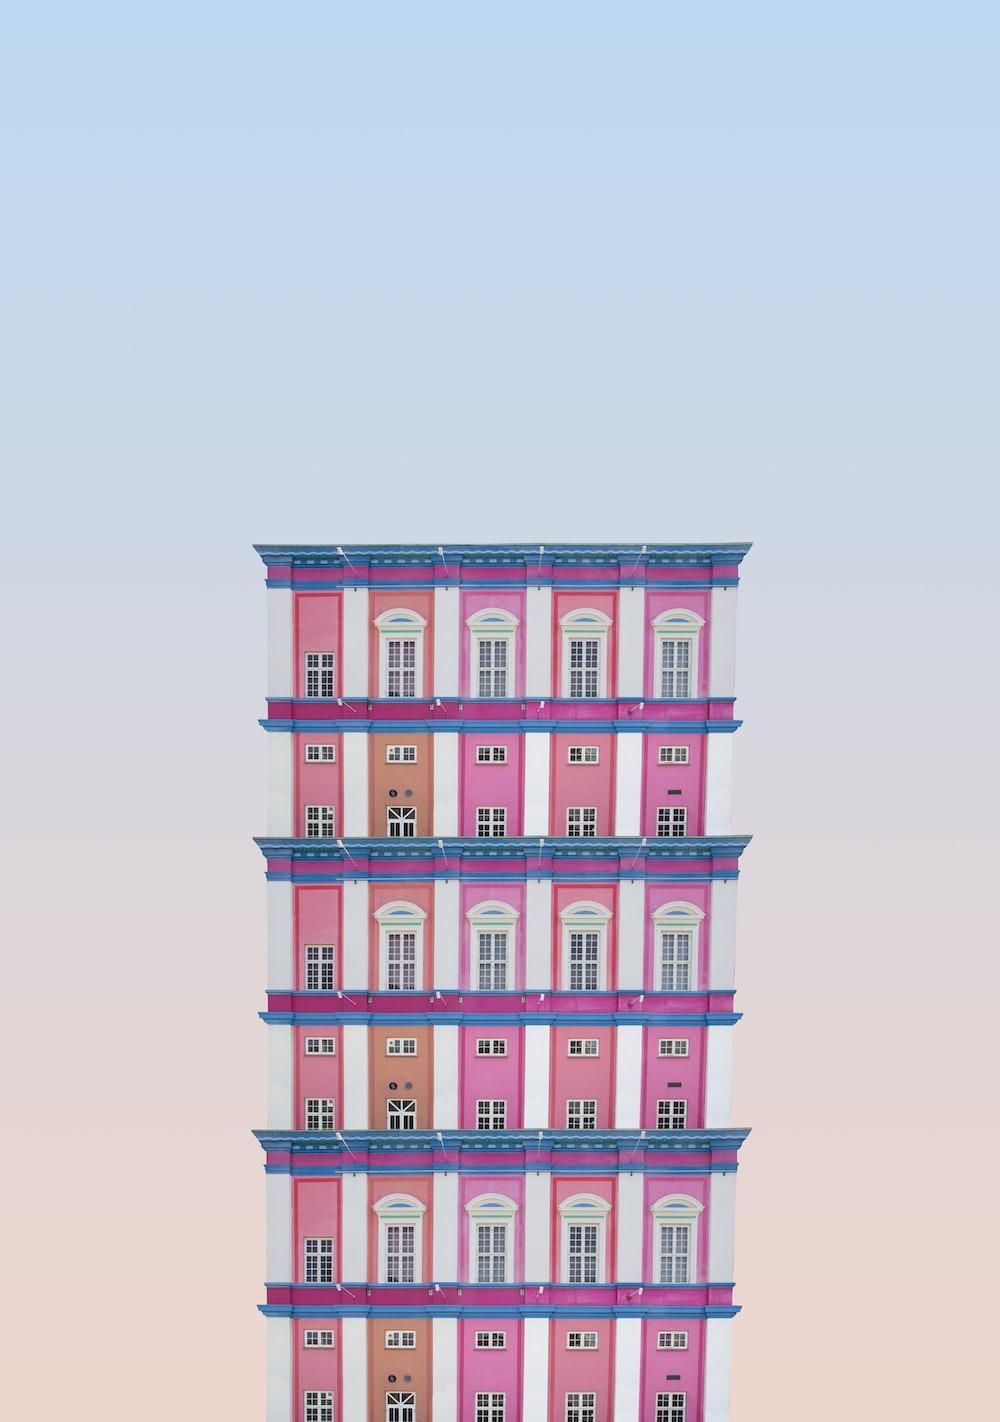 pink and orange 5-storey building